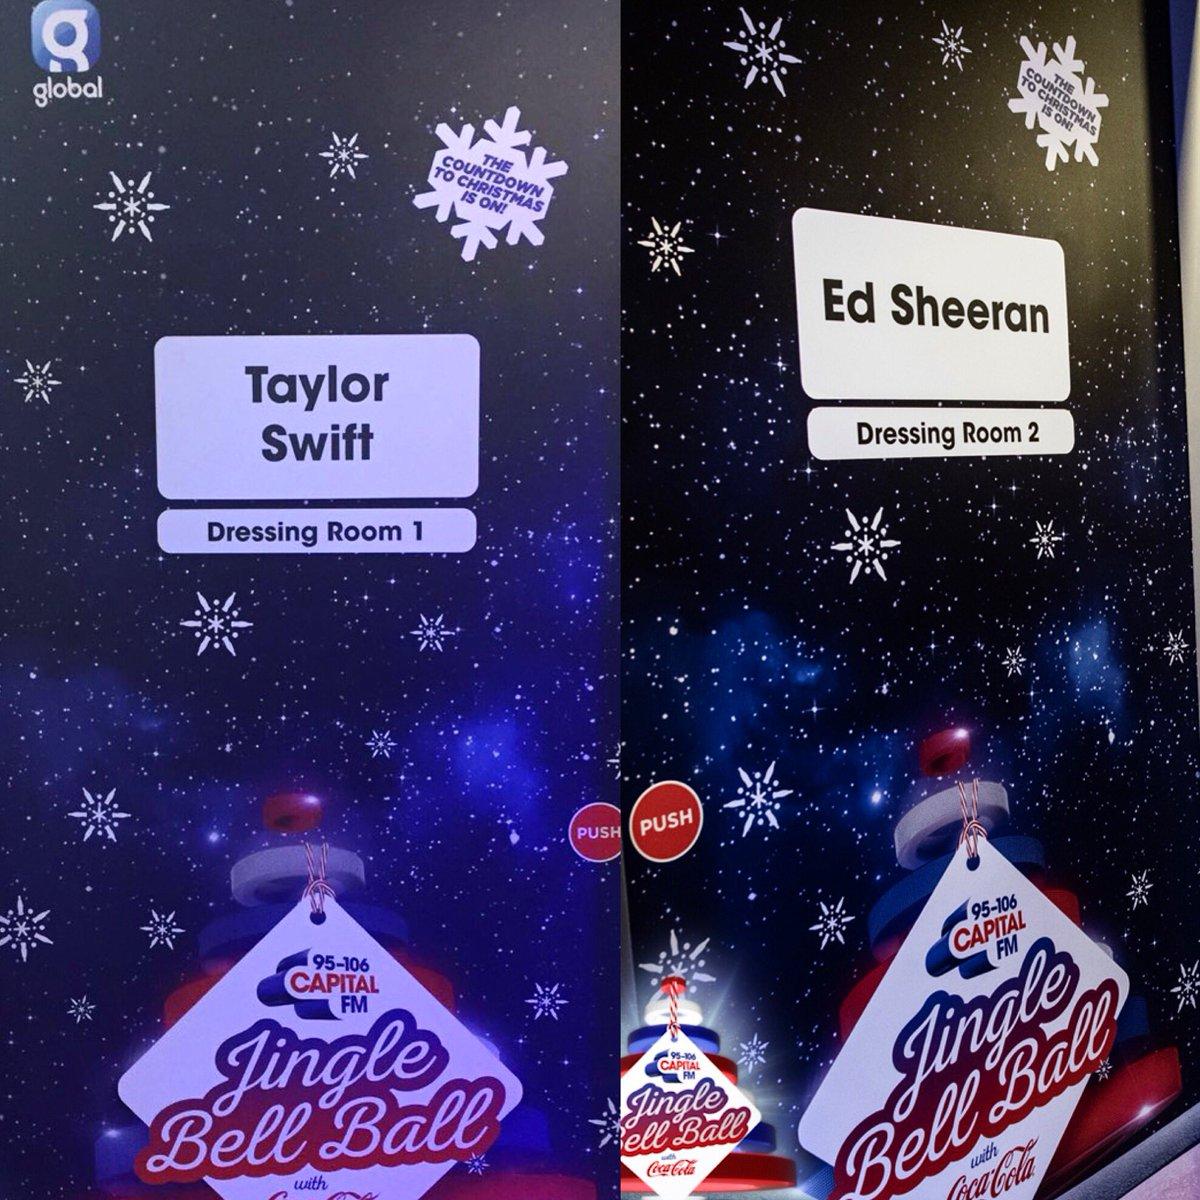 Oh hey @taylorswift13 & @edsheeran 👋 #CapitalJBB #TaylorSwift #EdSheeran